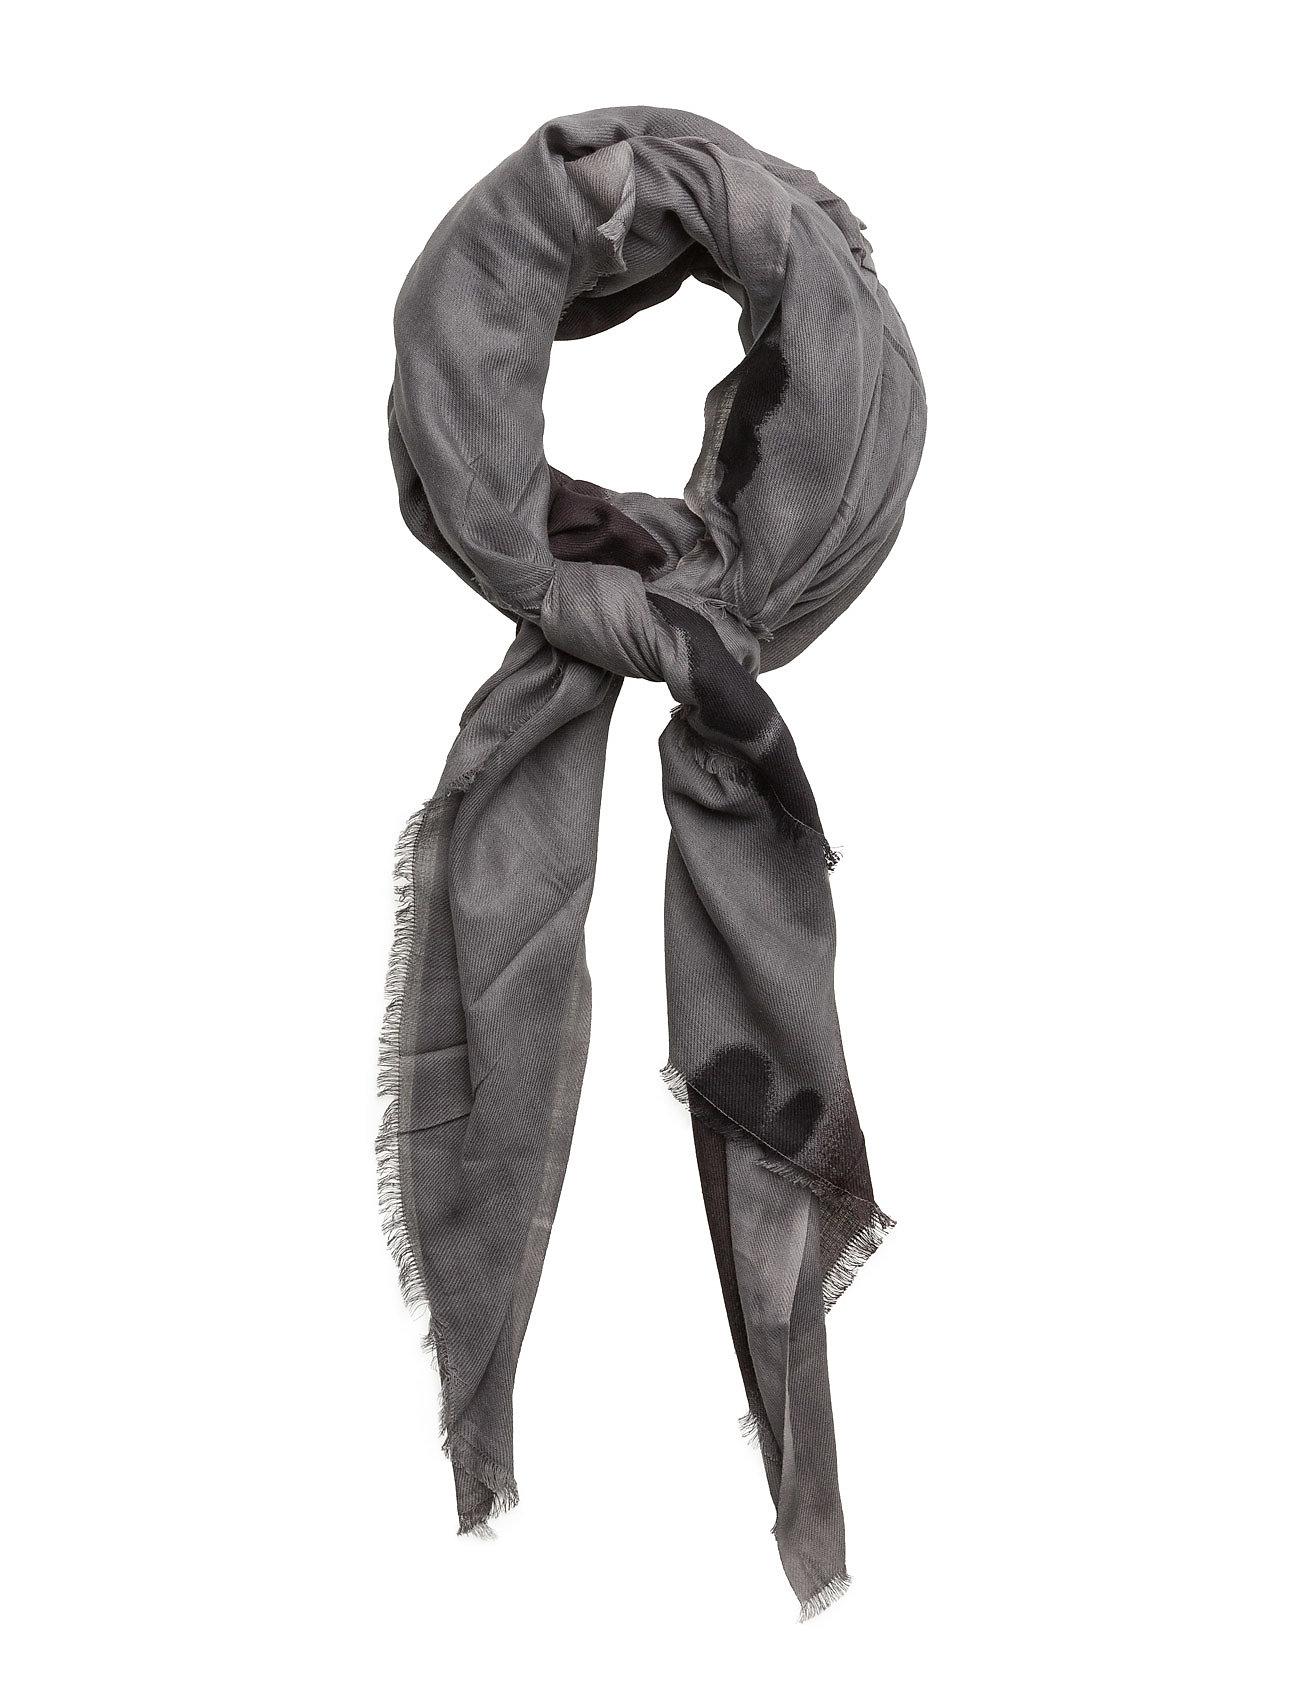 Art Brush Scarf UNMADE Copenhagen Halstørklæder til Damer i Grå